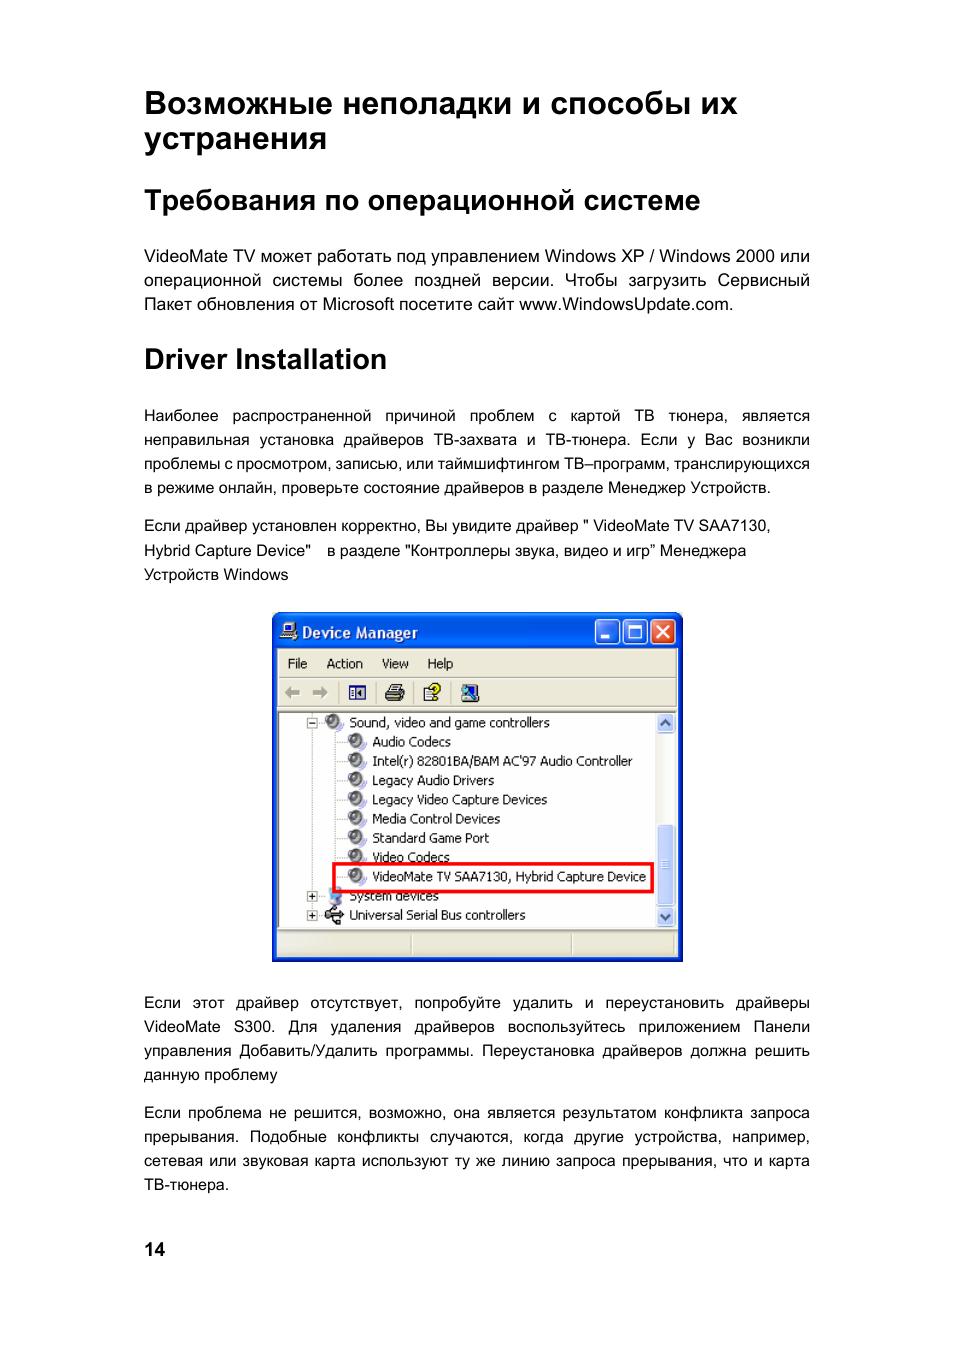 Driver philips saa7130 tv tuner/fm radio/video pci google docs.